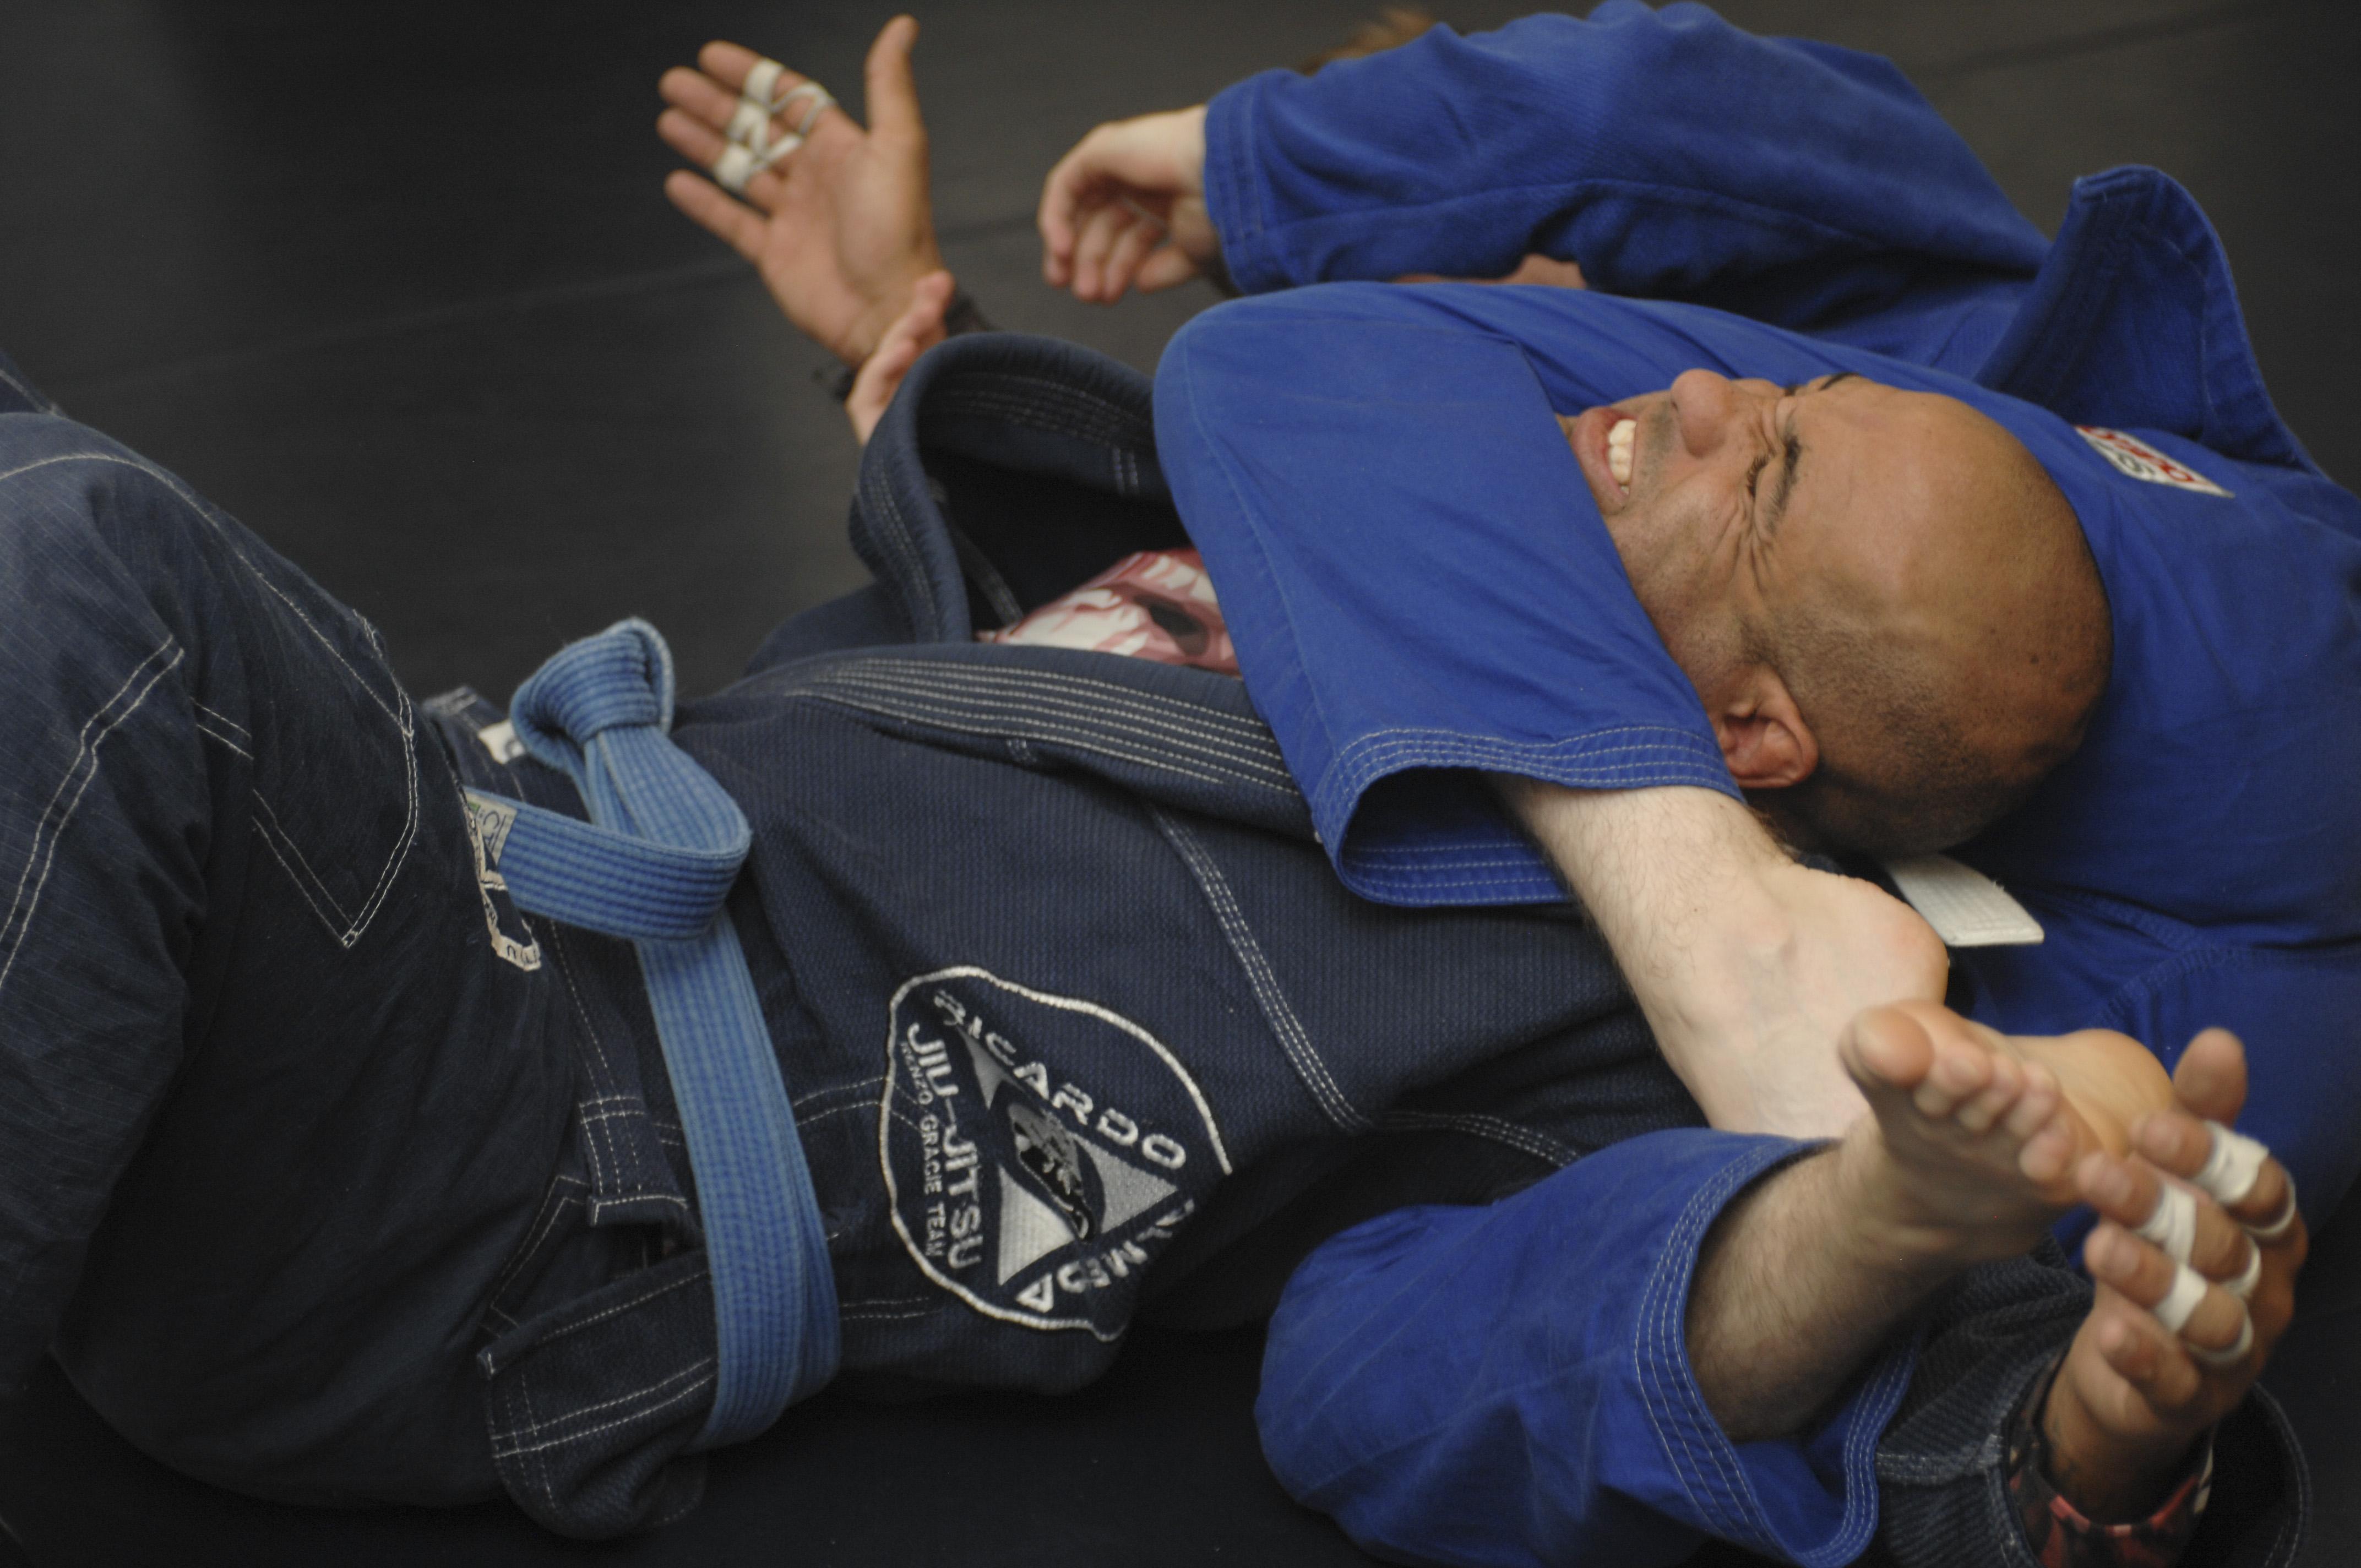 Free Brazilian jiujitsu class available at D-M > Davis